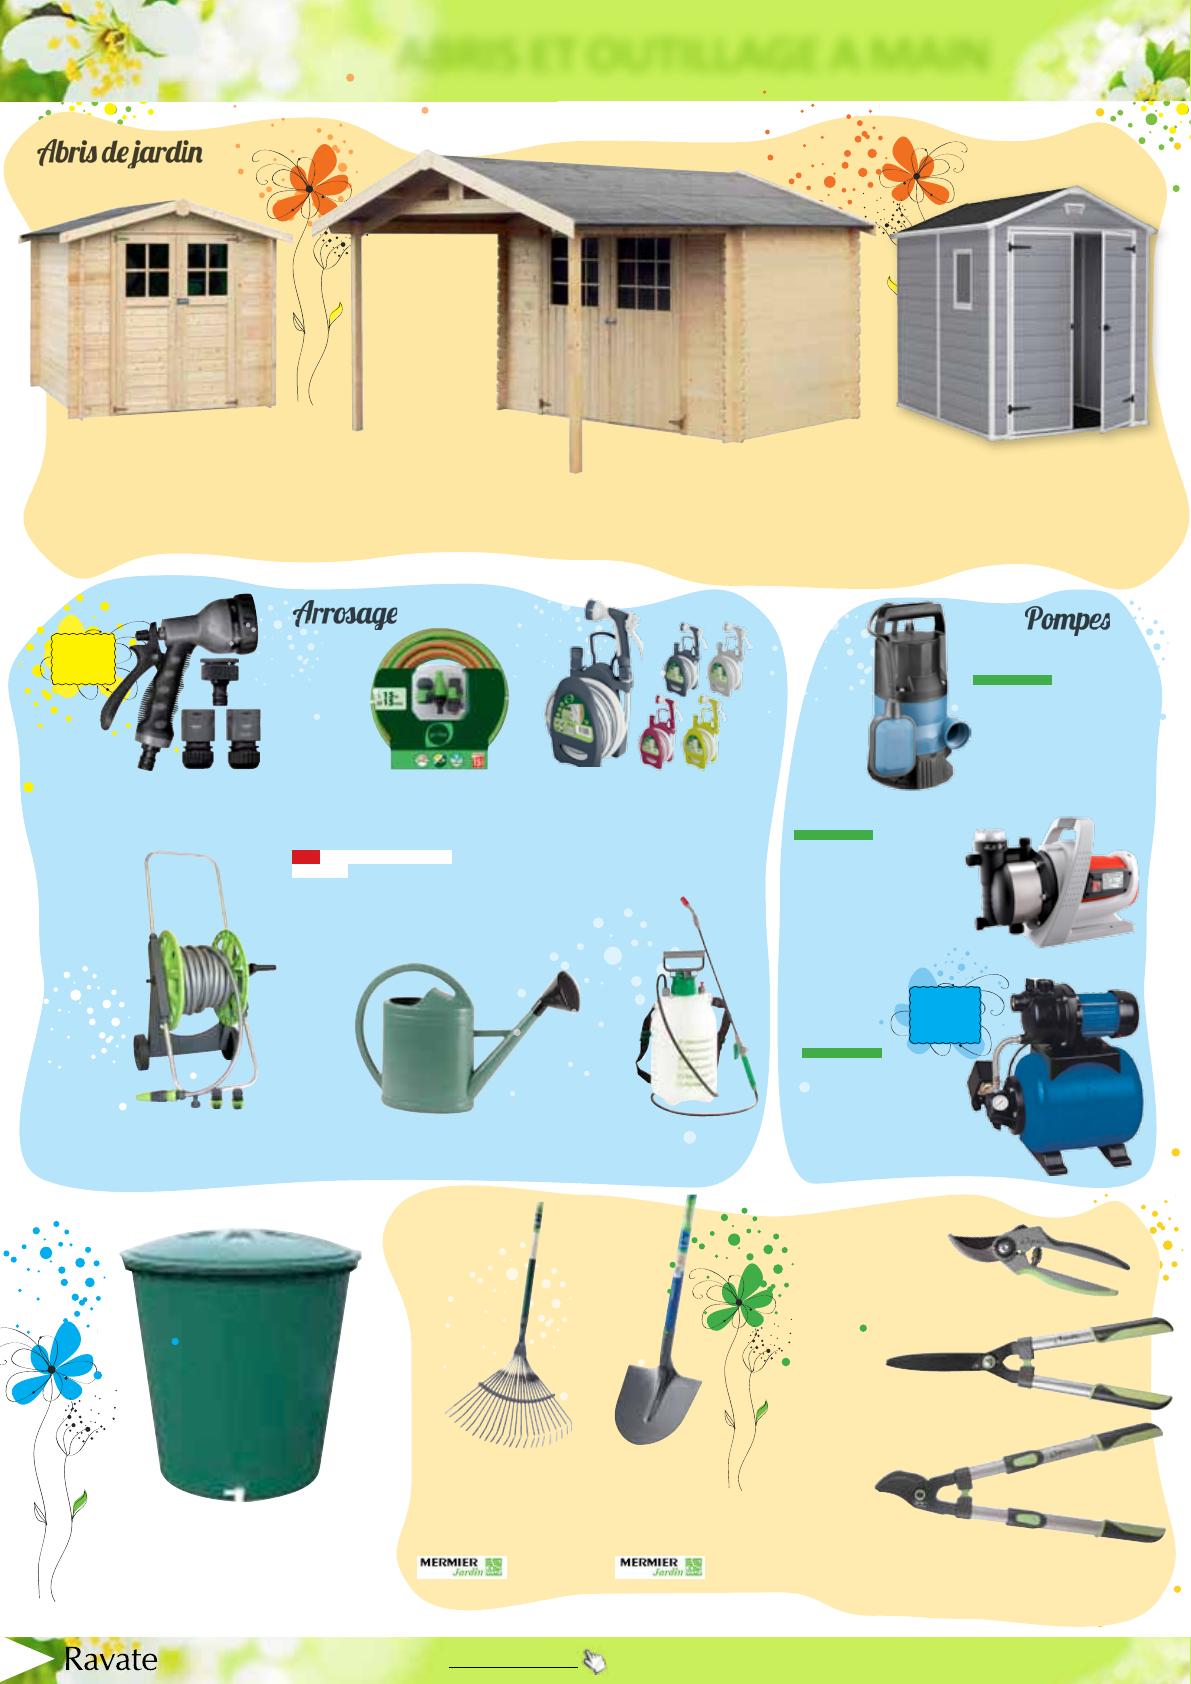 Ravate Jardin Octobre 2013 - [Pdf Document] encequiconcerne Mermier Jardin